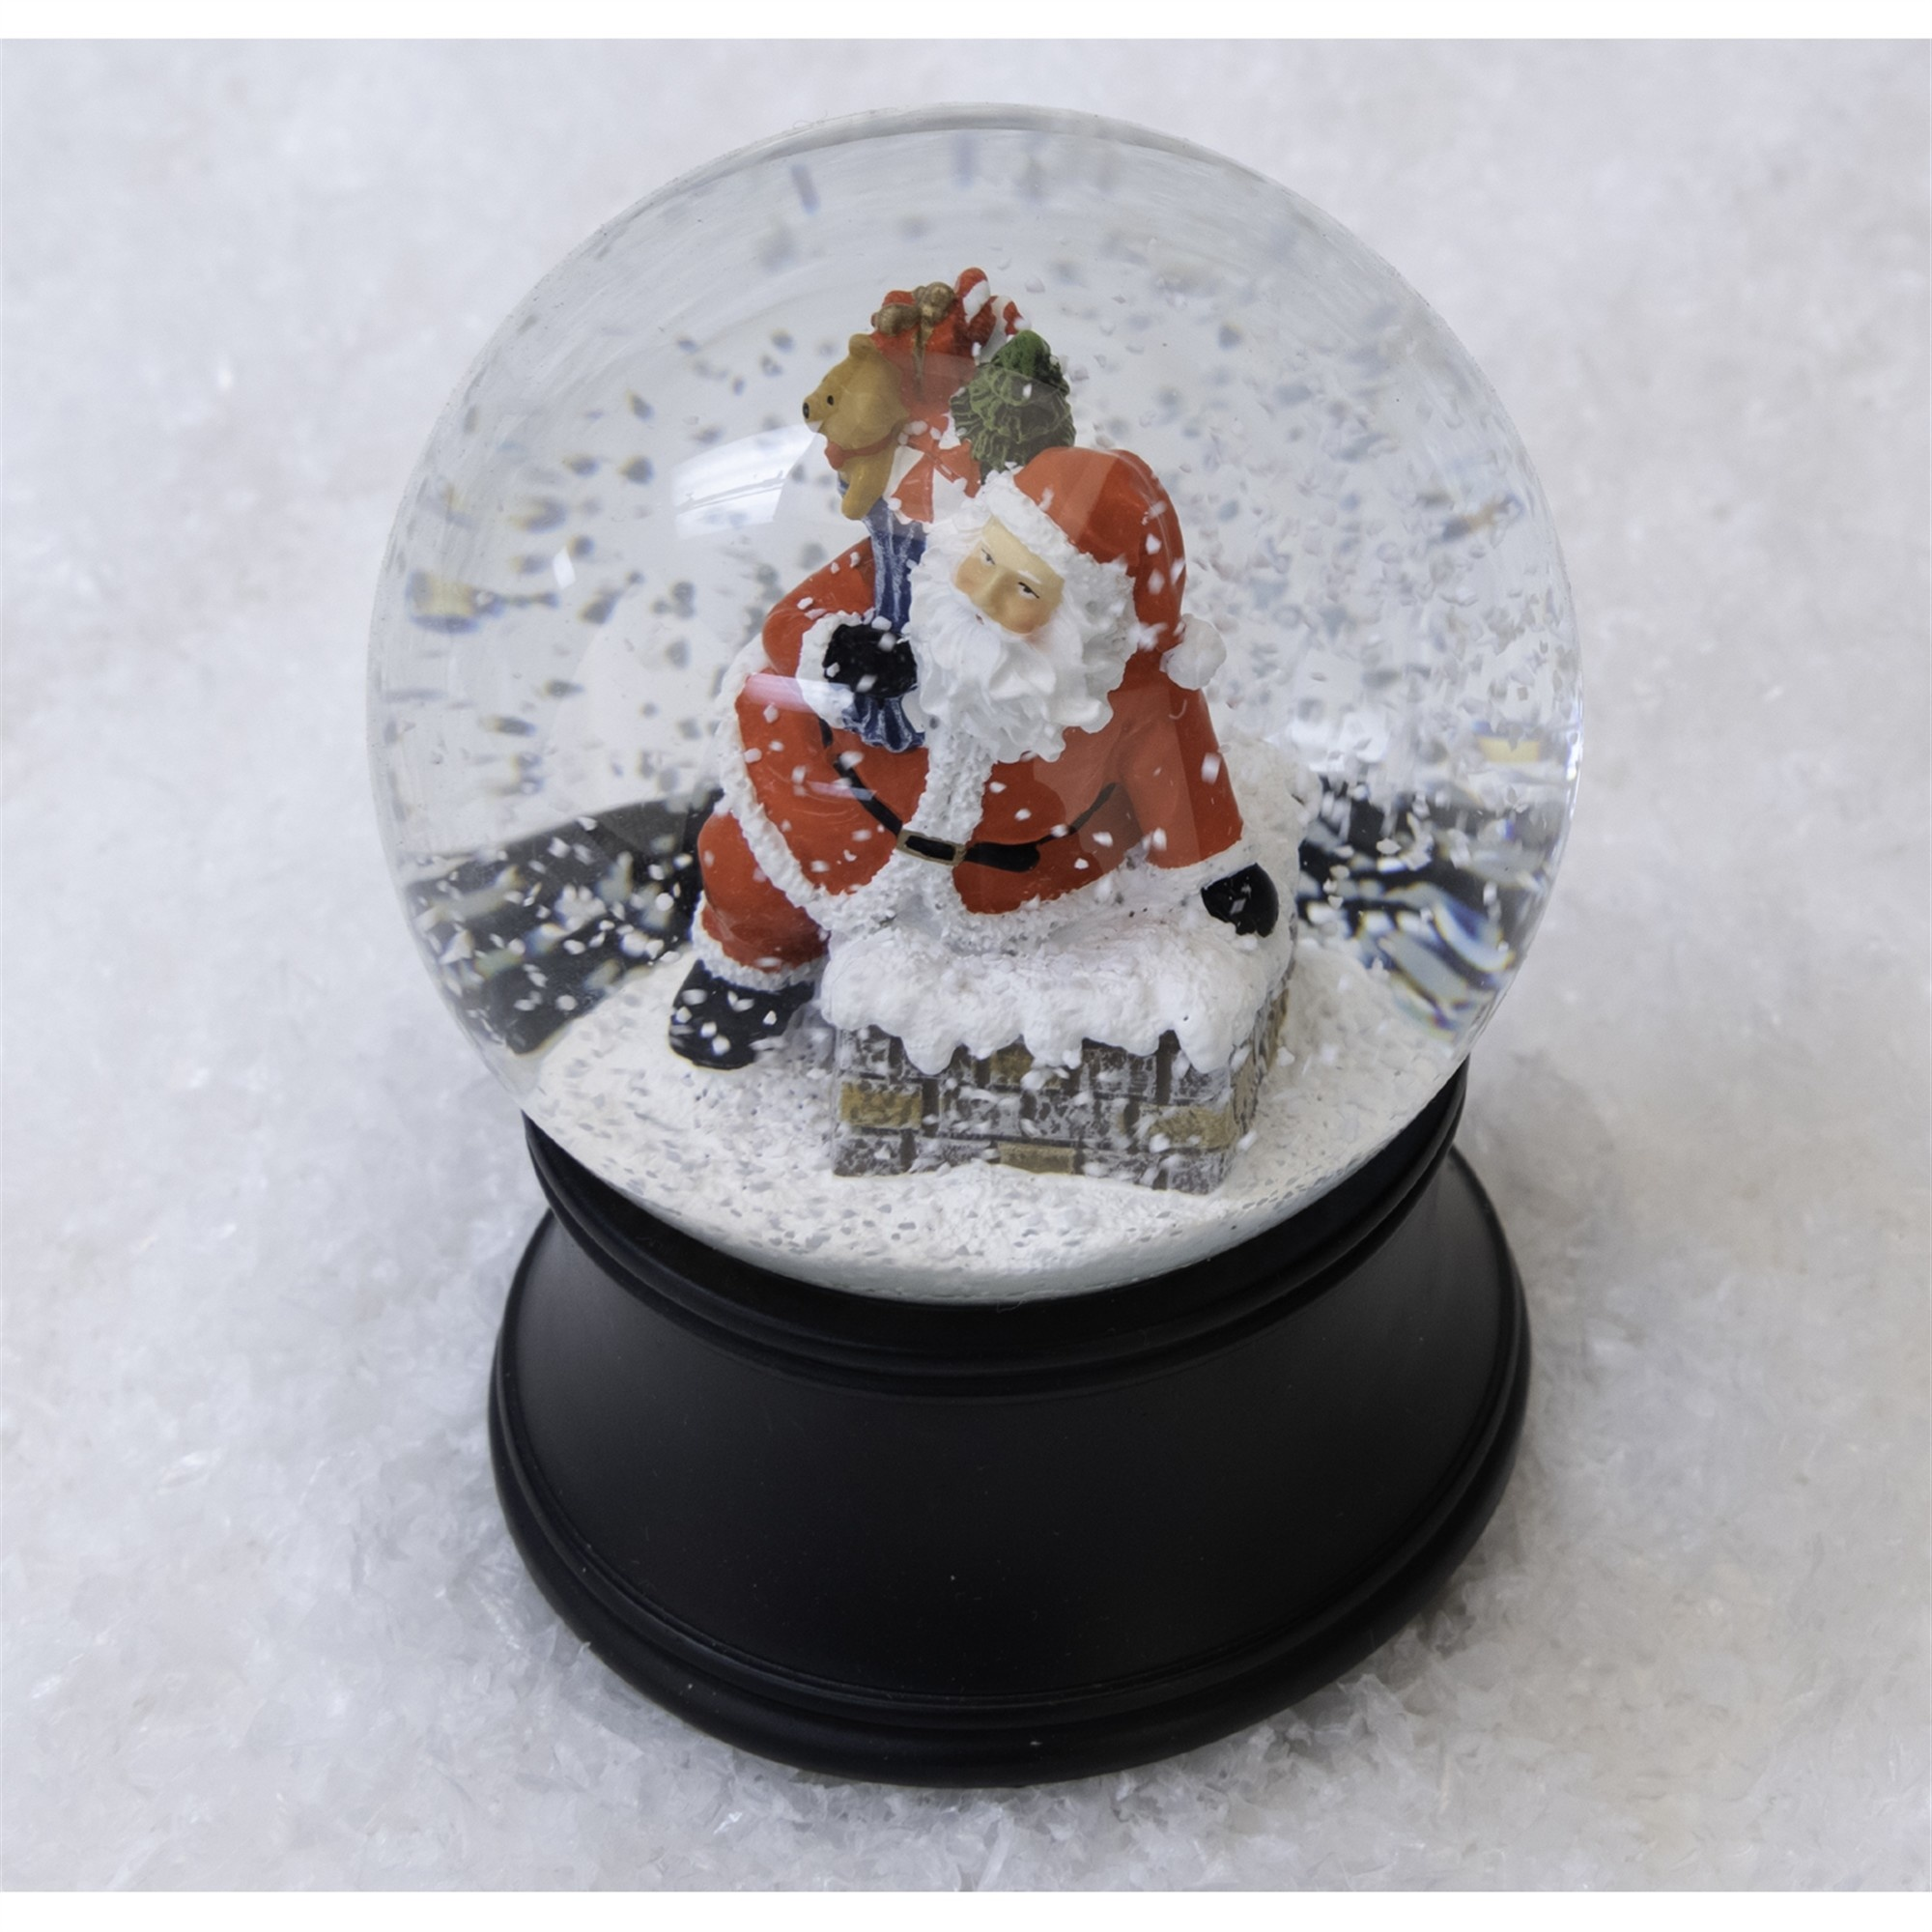 Musical Santa on Chimney Snow Globe